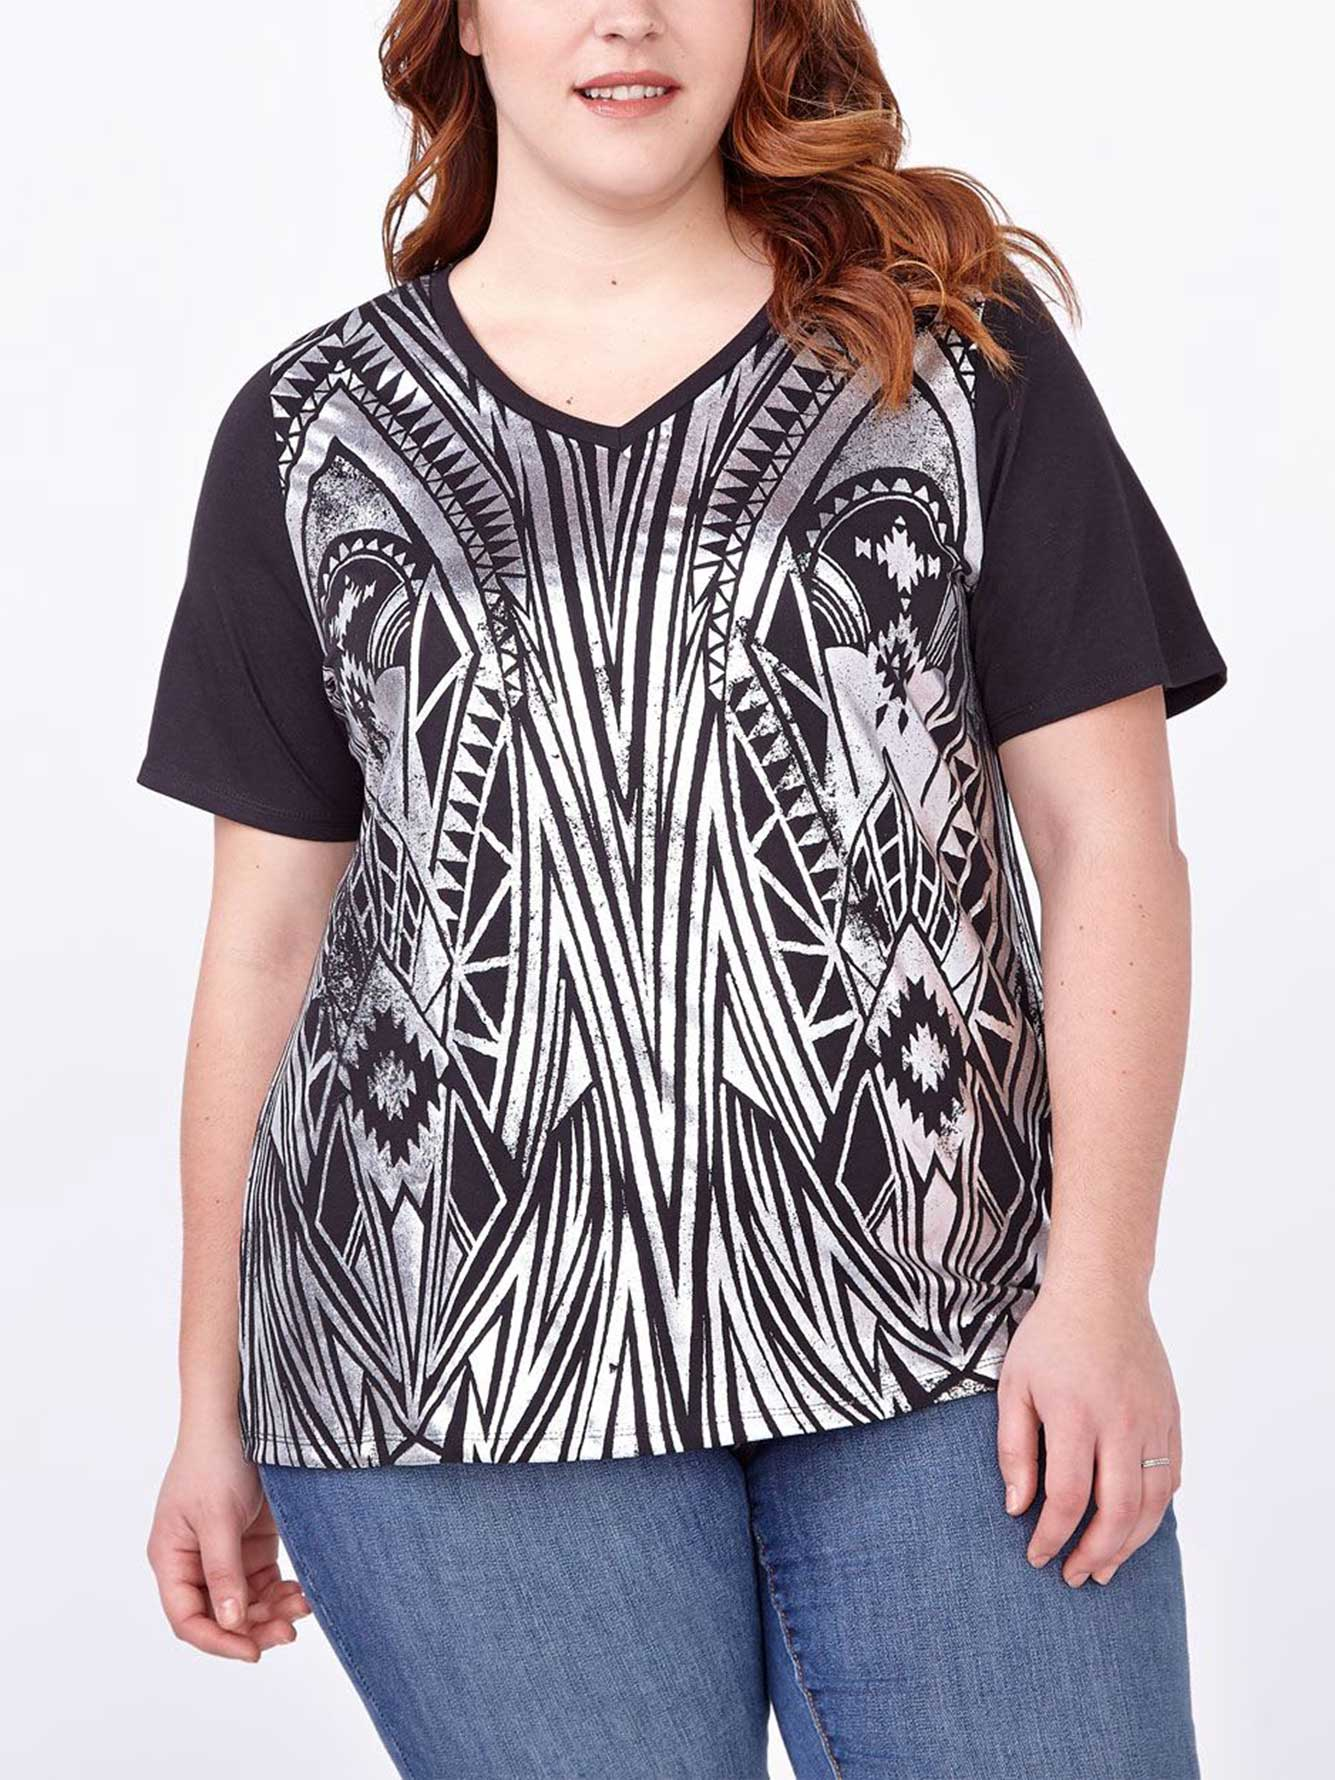 Shaped fit foil print t shirt penningtons for Foil print t shirts custom